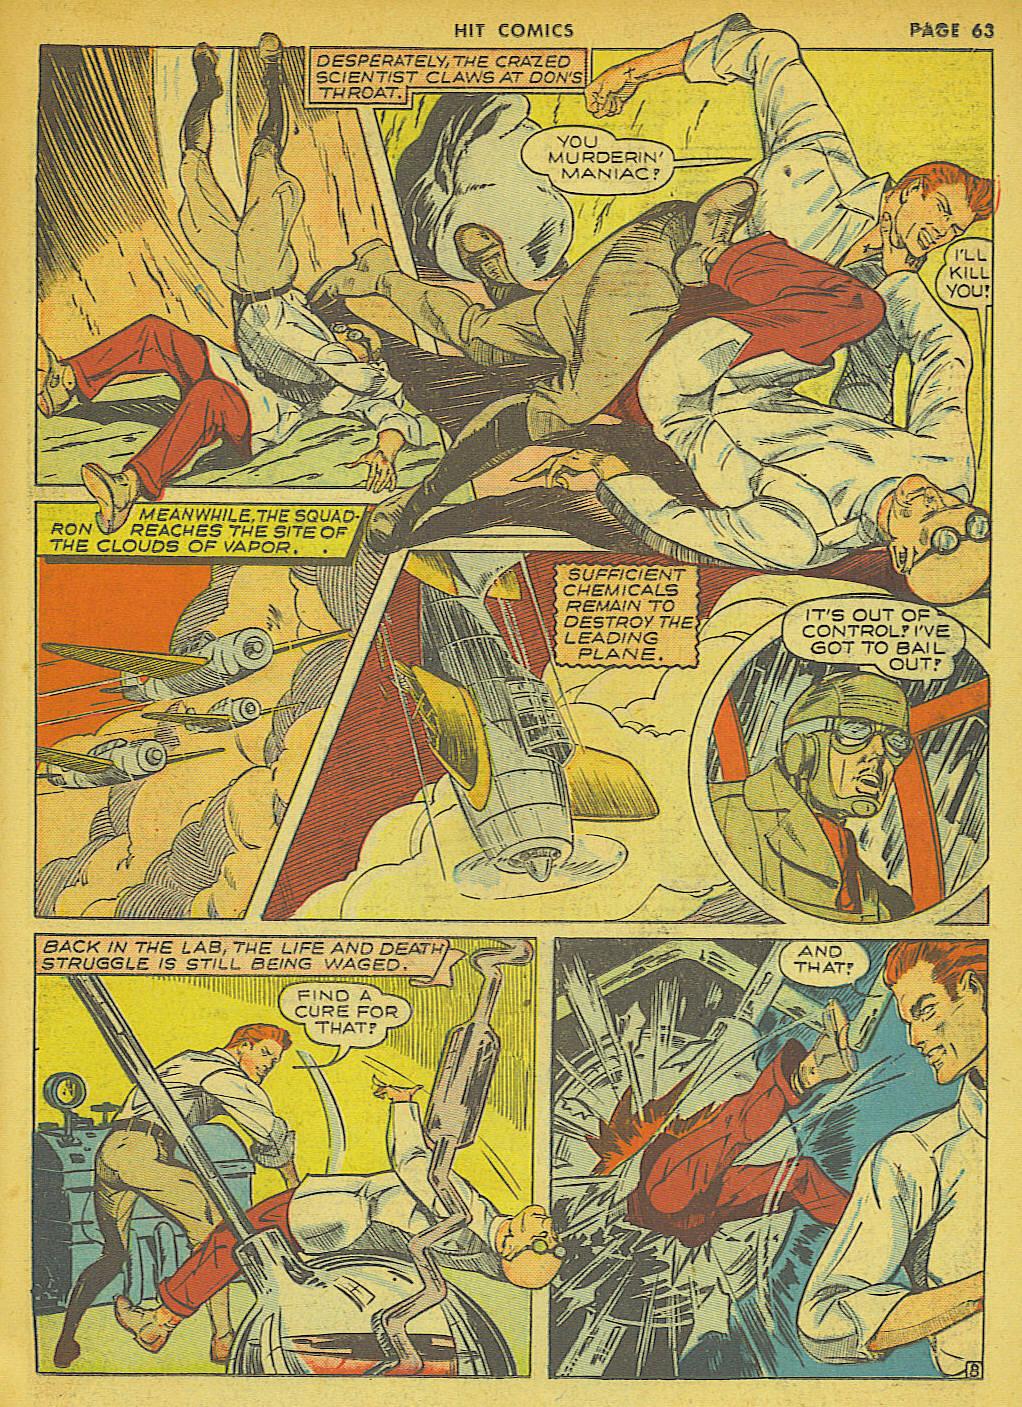 Read online Hit Comics comic -  Issue #21 - 65